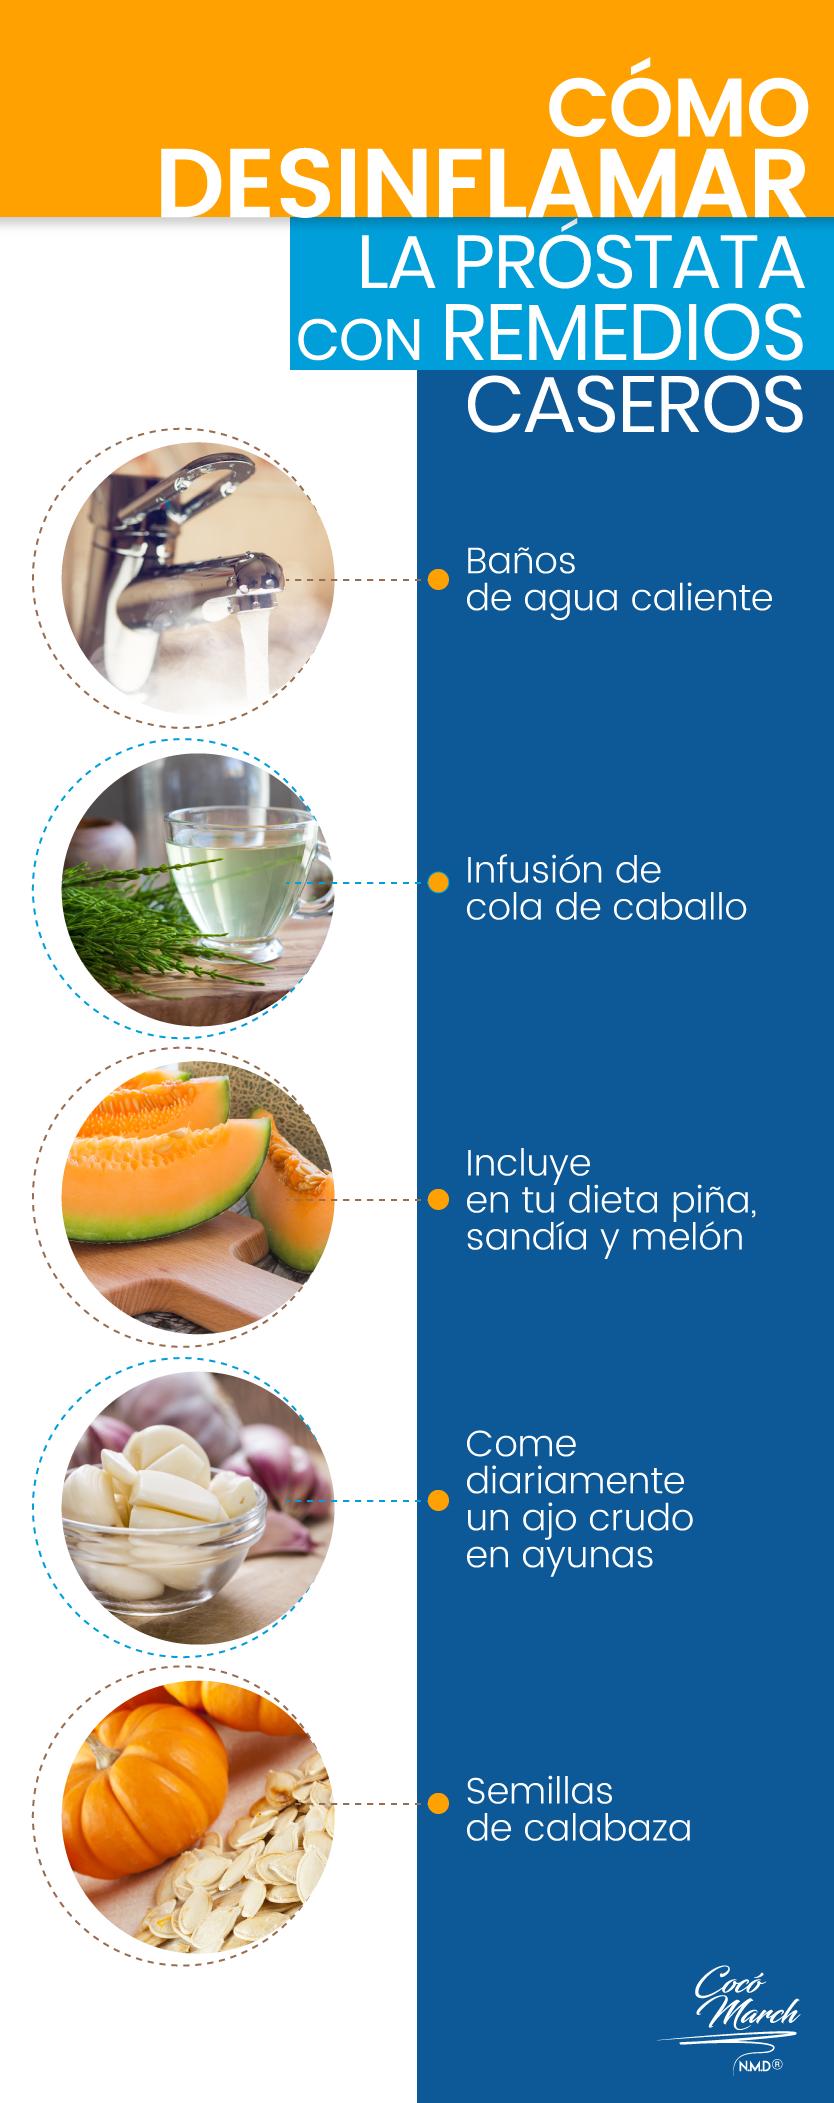 remedios-caseros-para-desinflamar-la-prostata